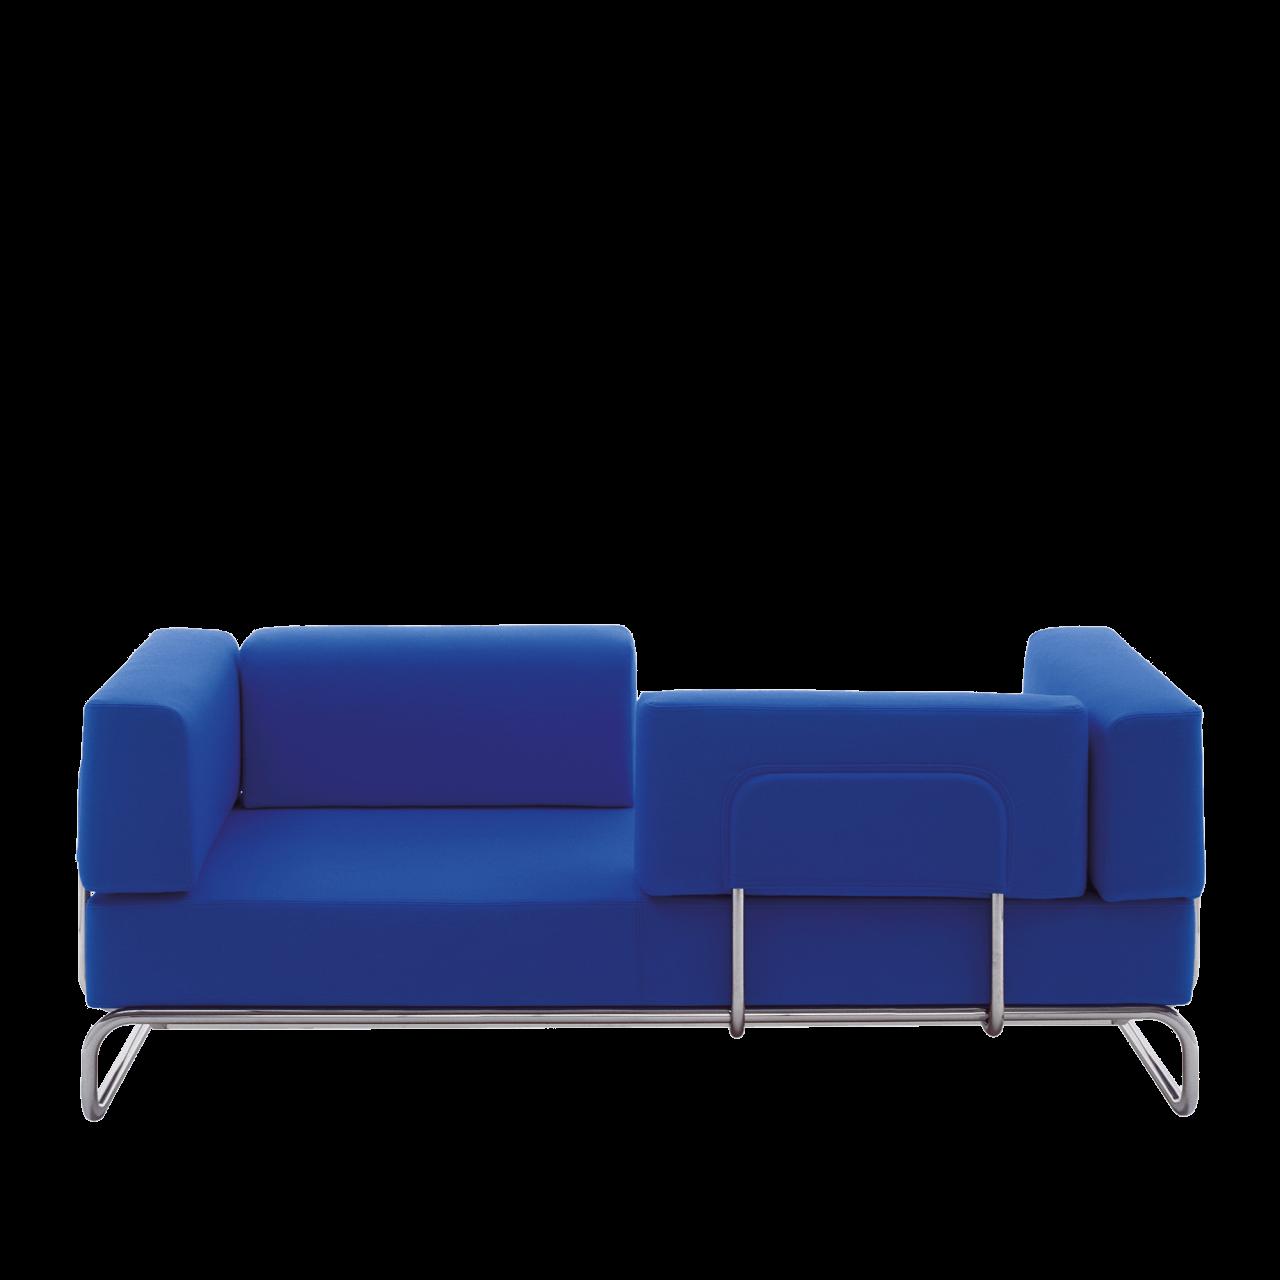 S 5000 Sofa